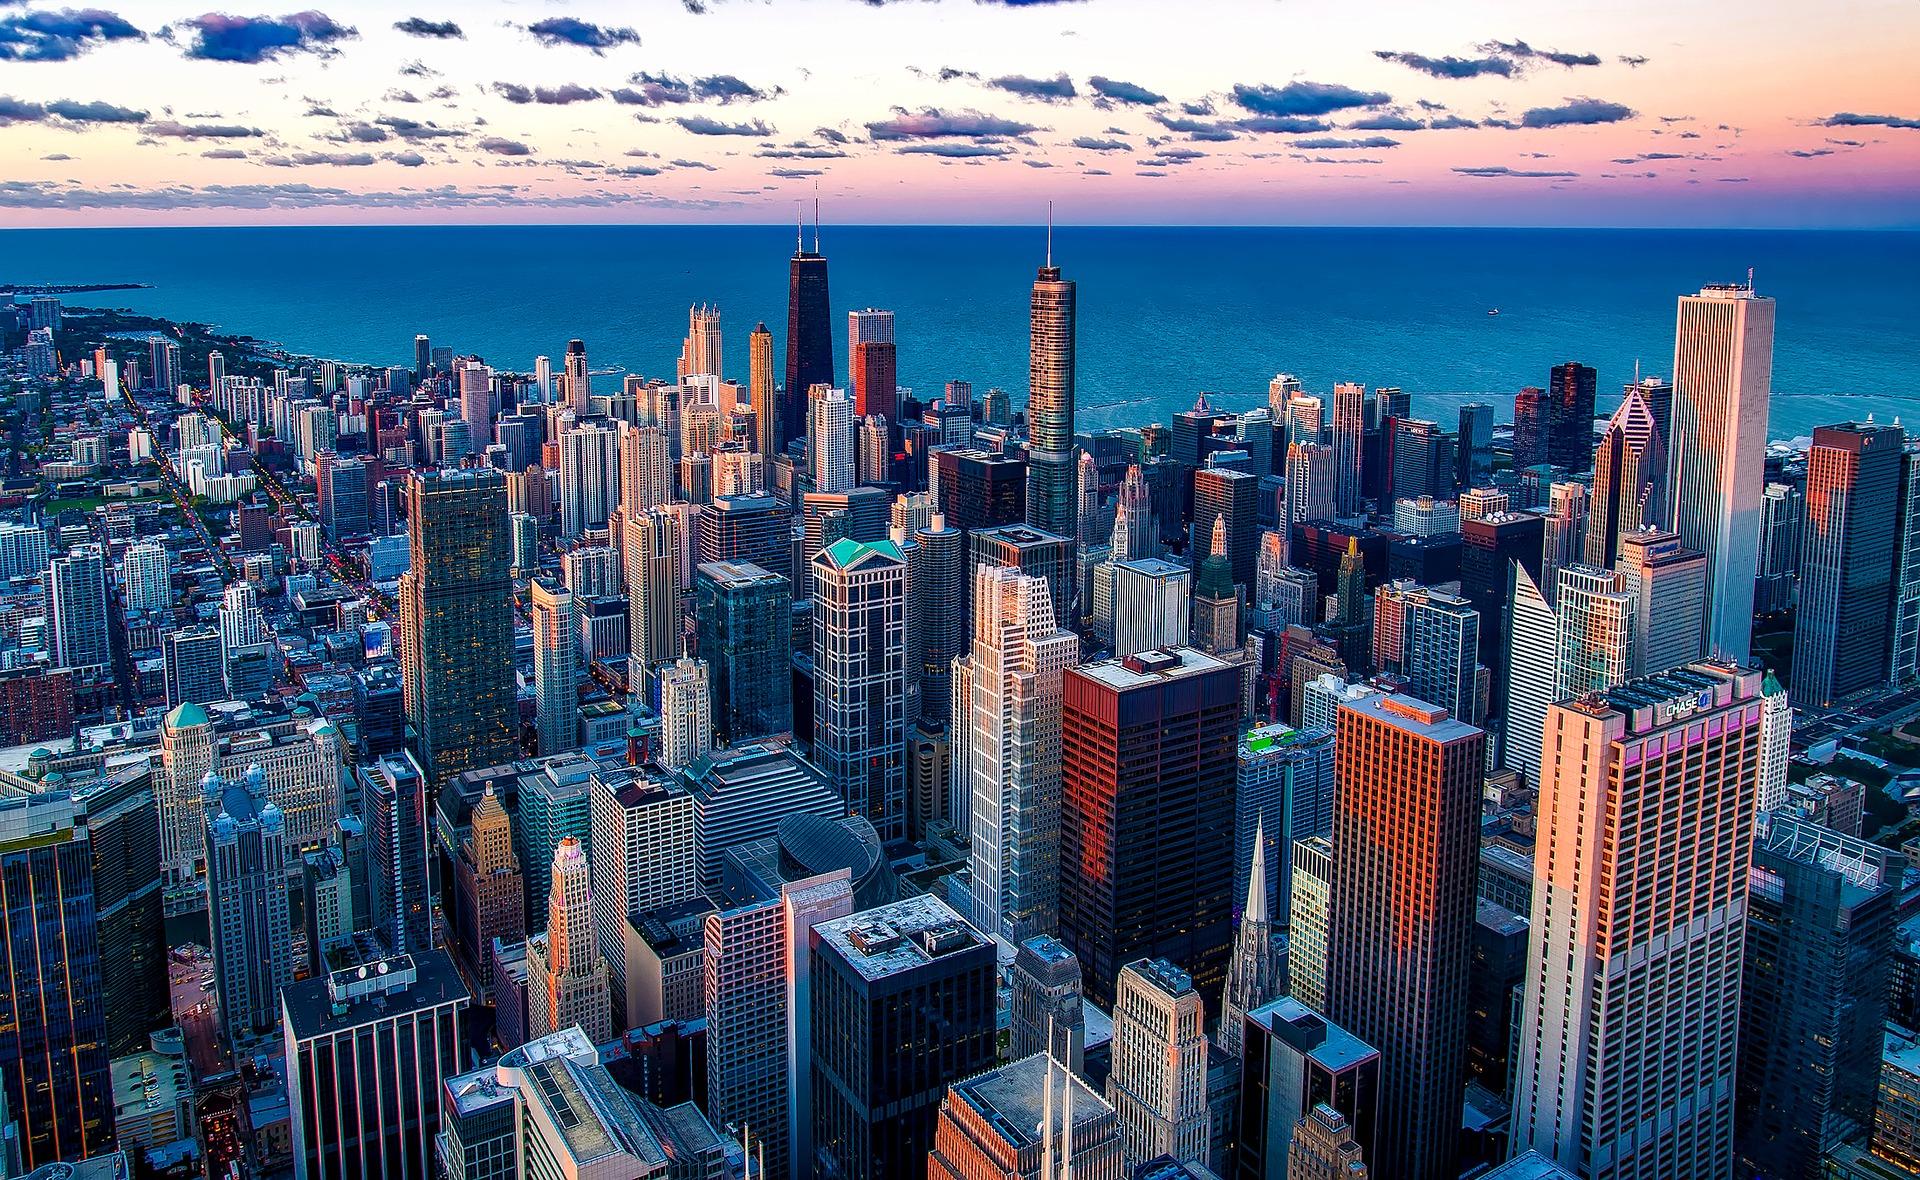 A Chicago skyline.